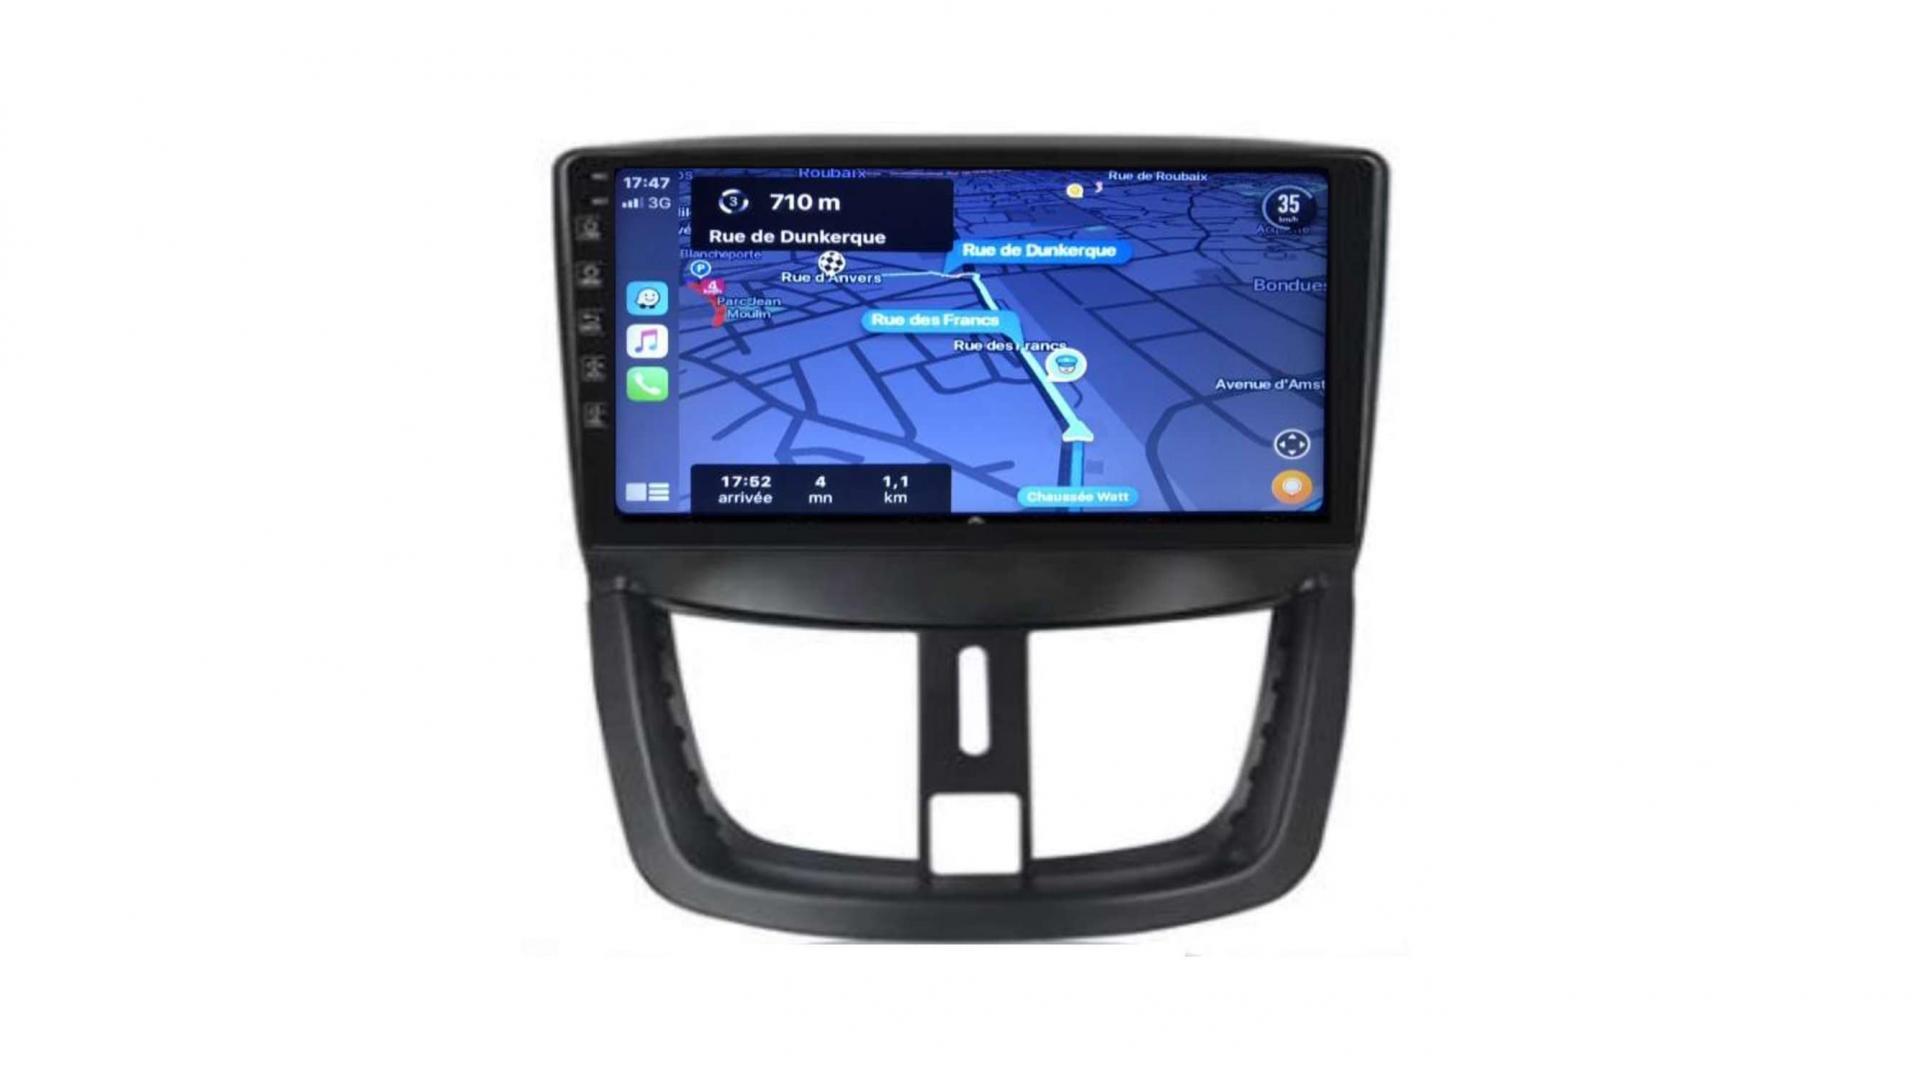 Peugeot 206 207 3008 5008 408 rcz autoradio gps bluetooth android auto carplay camera de recul commande au volant1